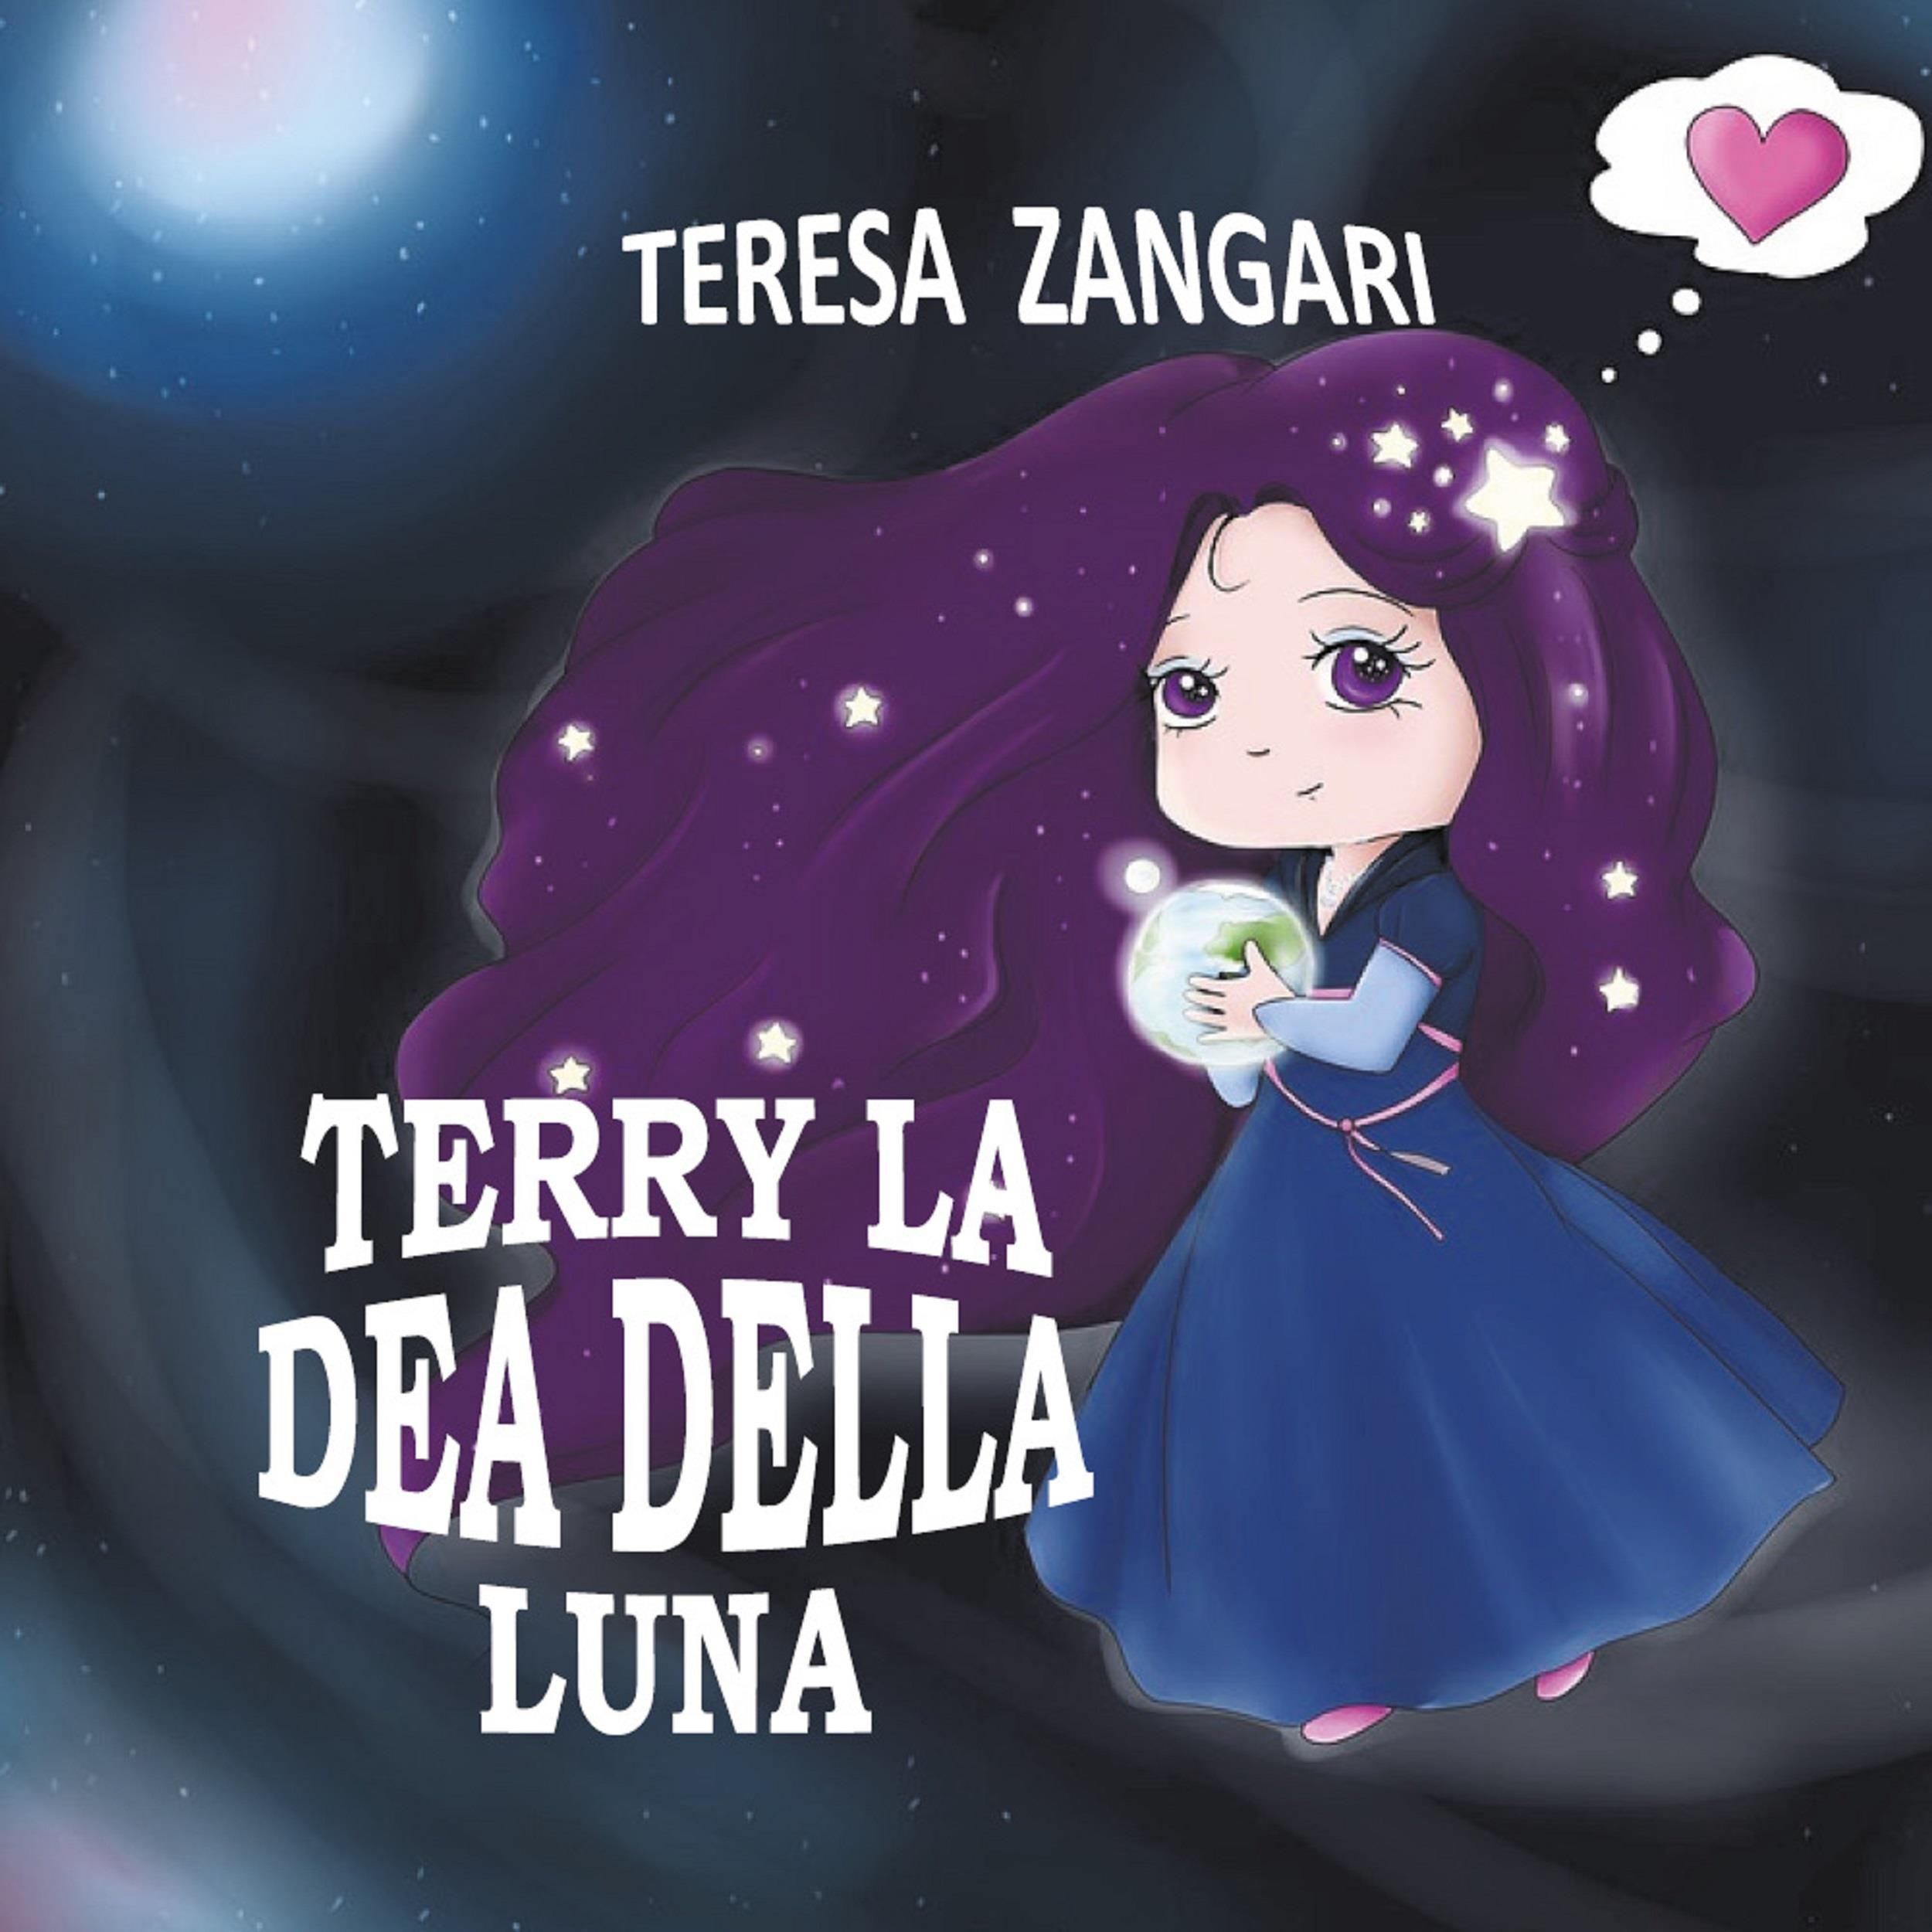 Terry la dea della luna